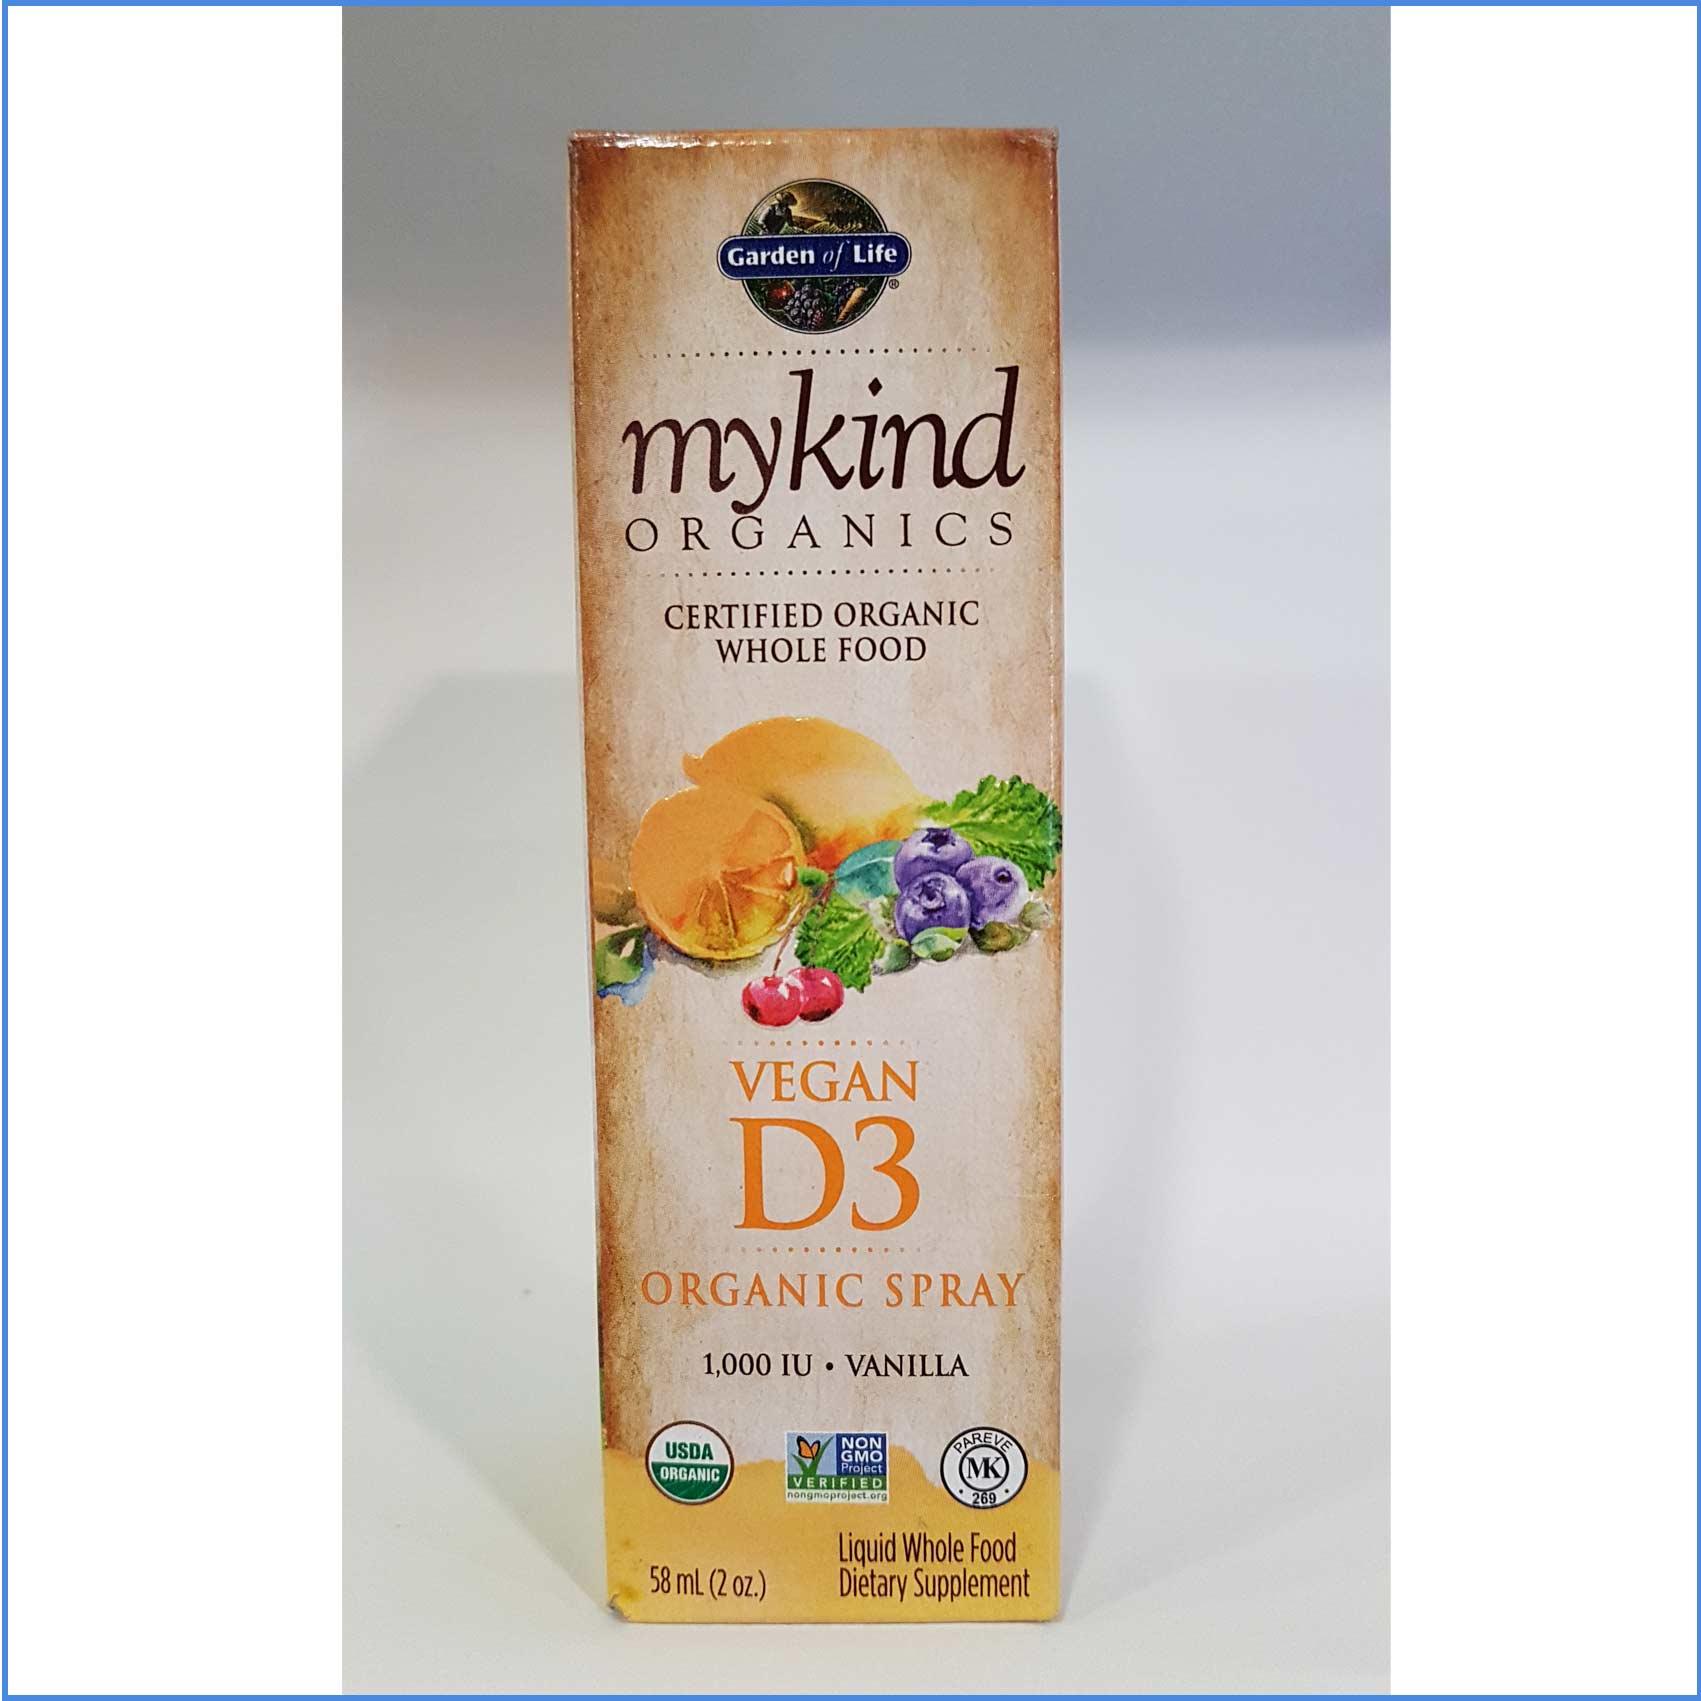 D3 Mykind